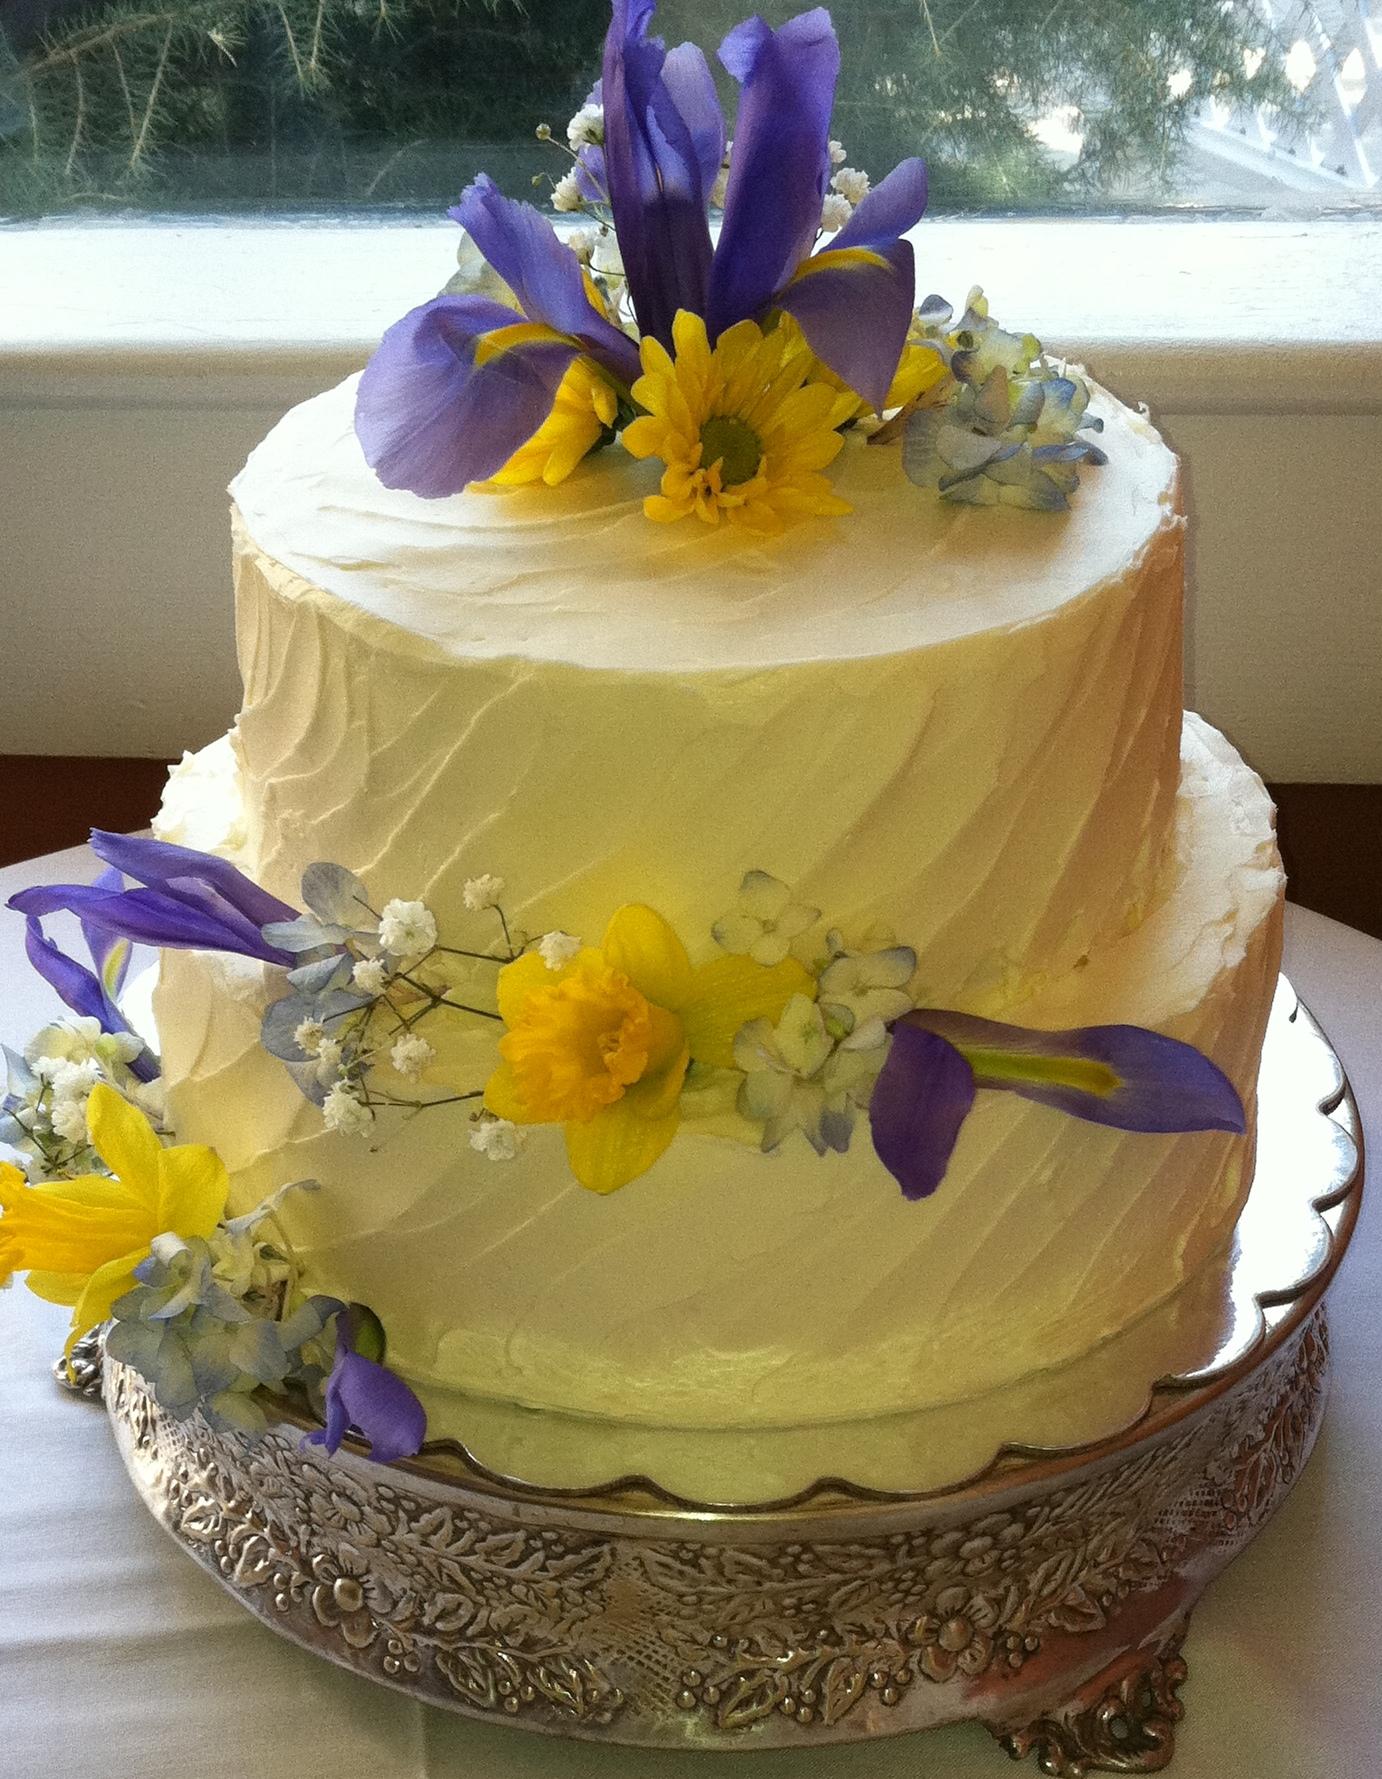 Blakemere White Chocolate Berry 2 Tier Celebration Cake